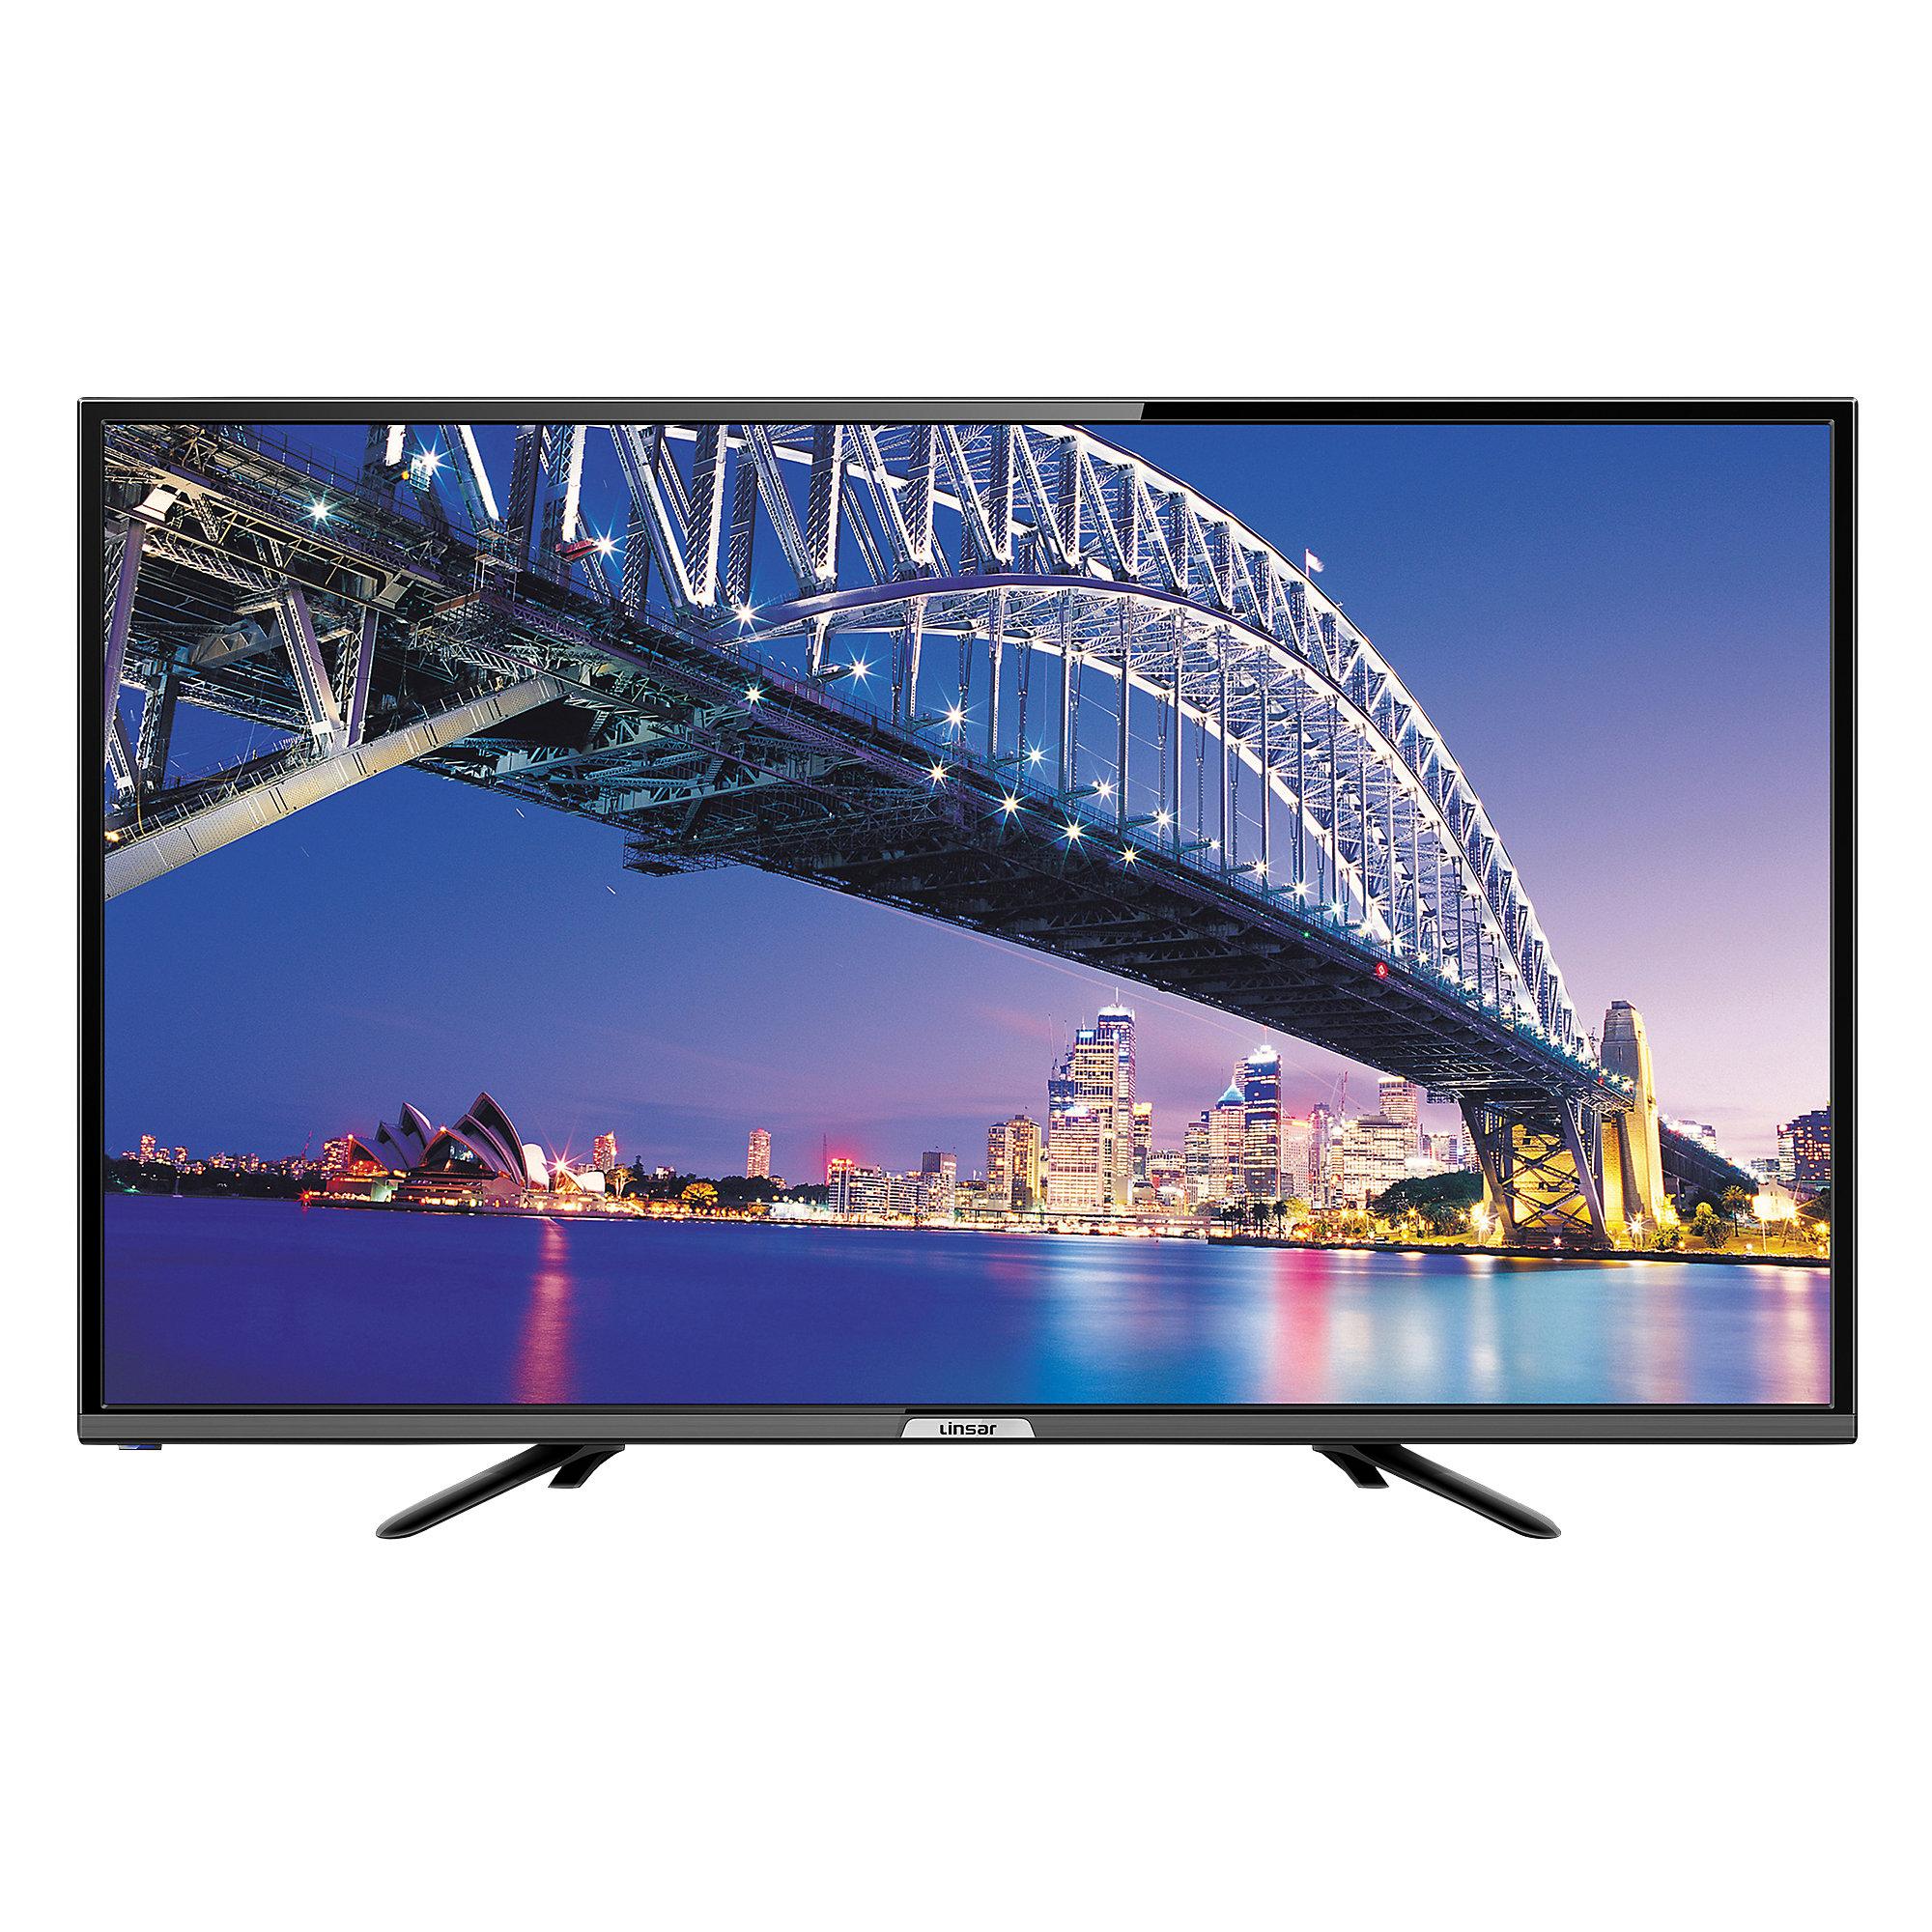 Linsar LED-LCD TV DG-320H 80 cm (31.5 Inch)